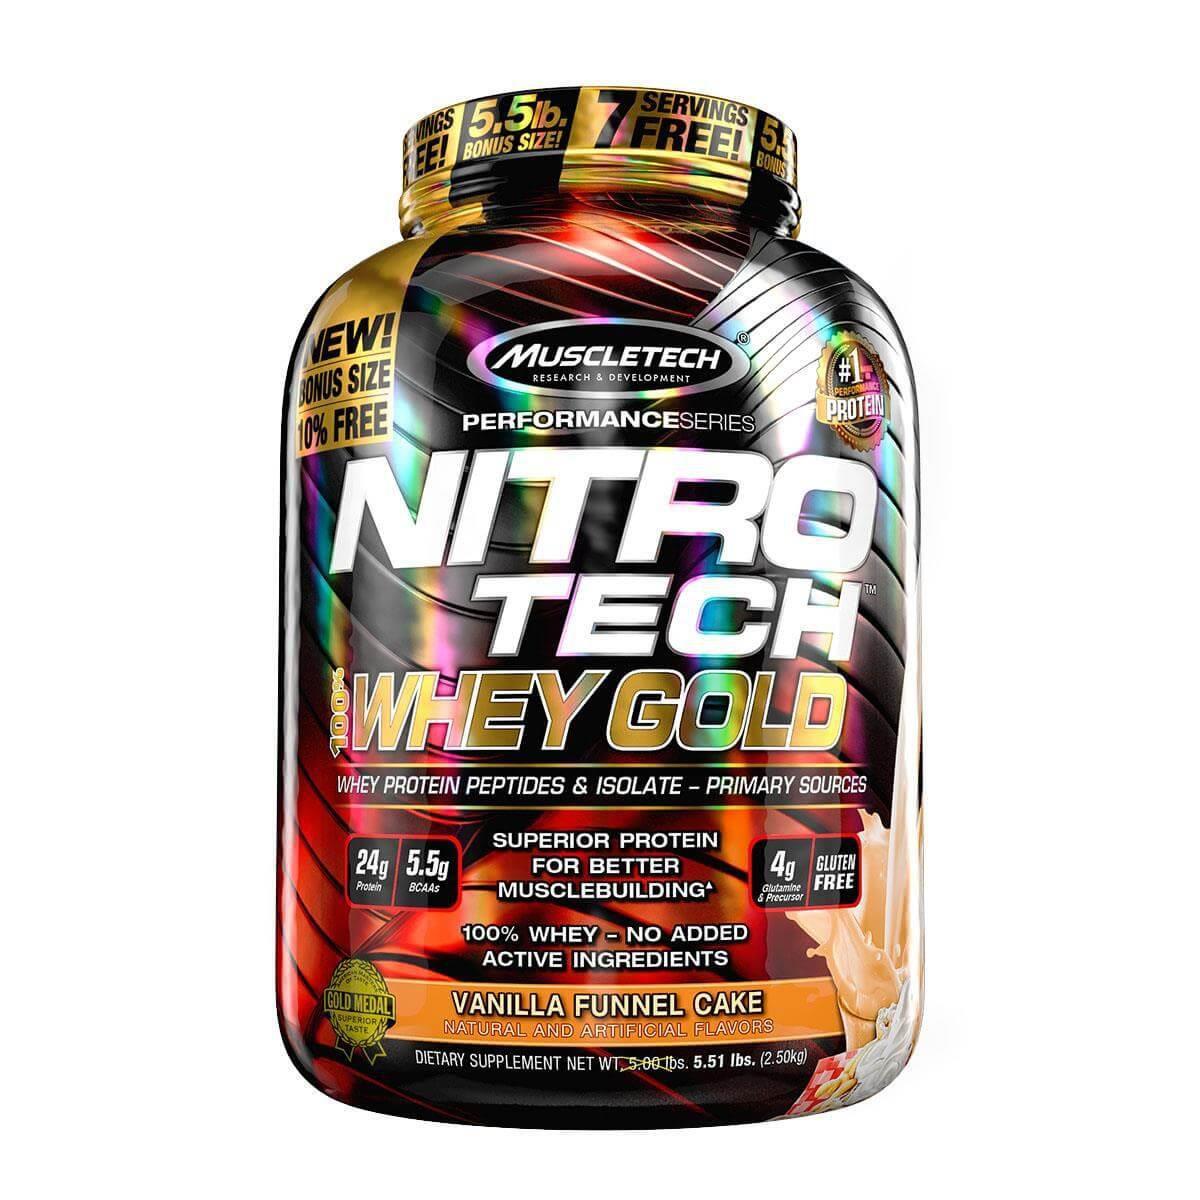 NITRO TECH 100% WHEY GOLD 5,53LB - MUSCLETECH